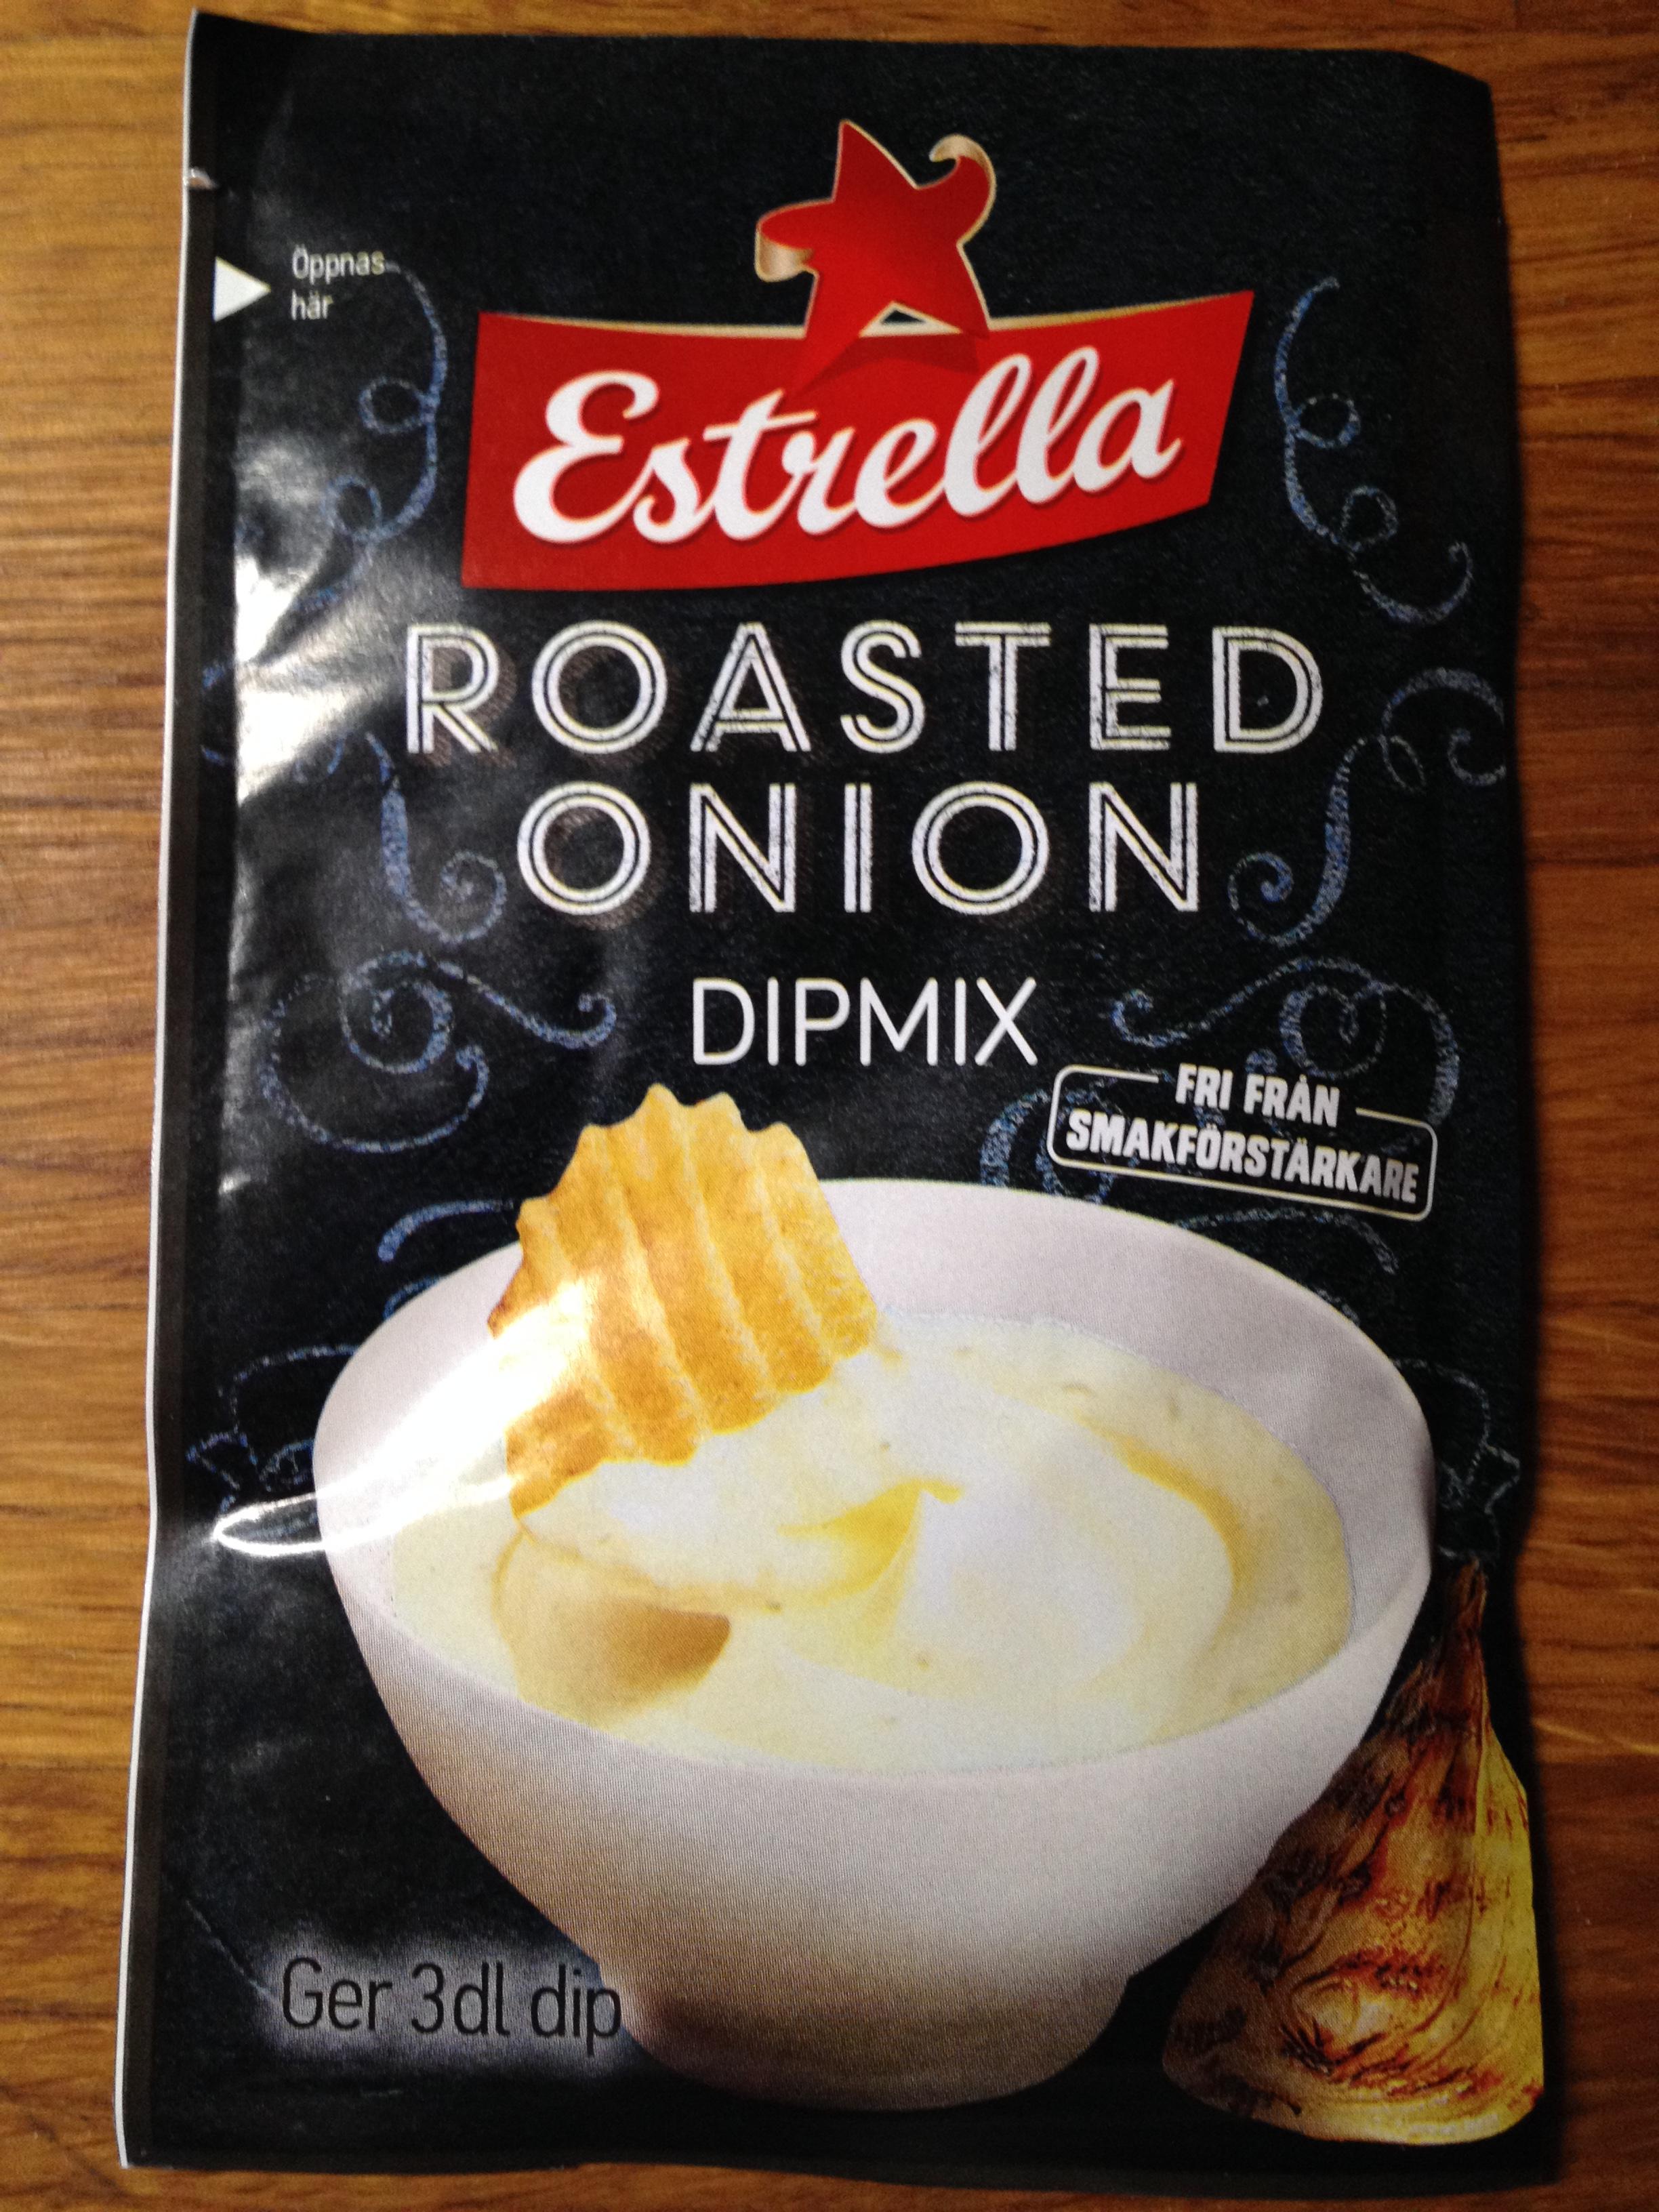 Estrella Roasted Onion Dipmix